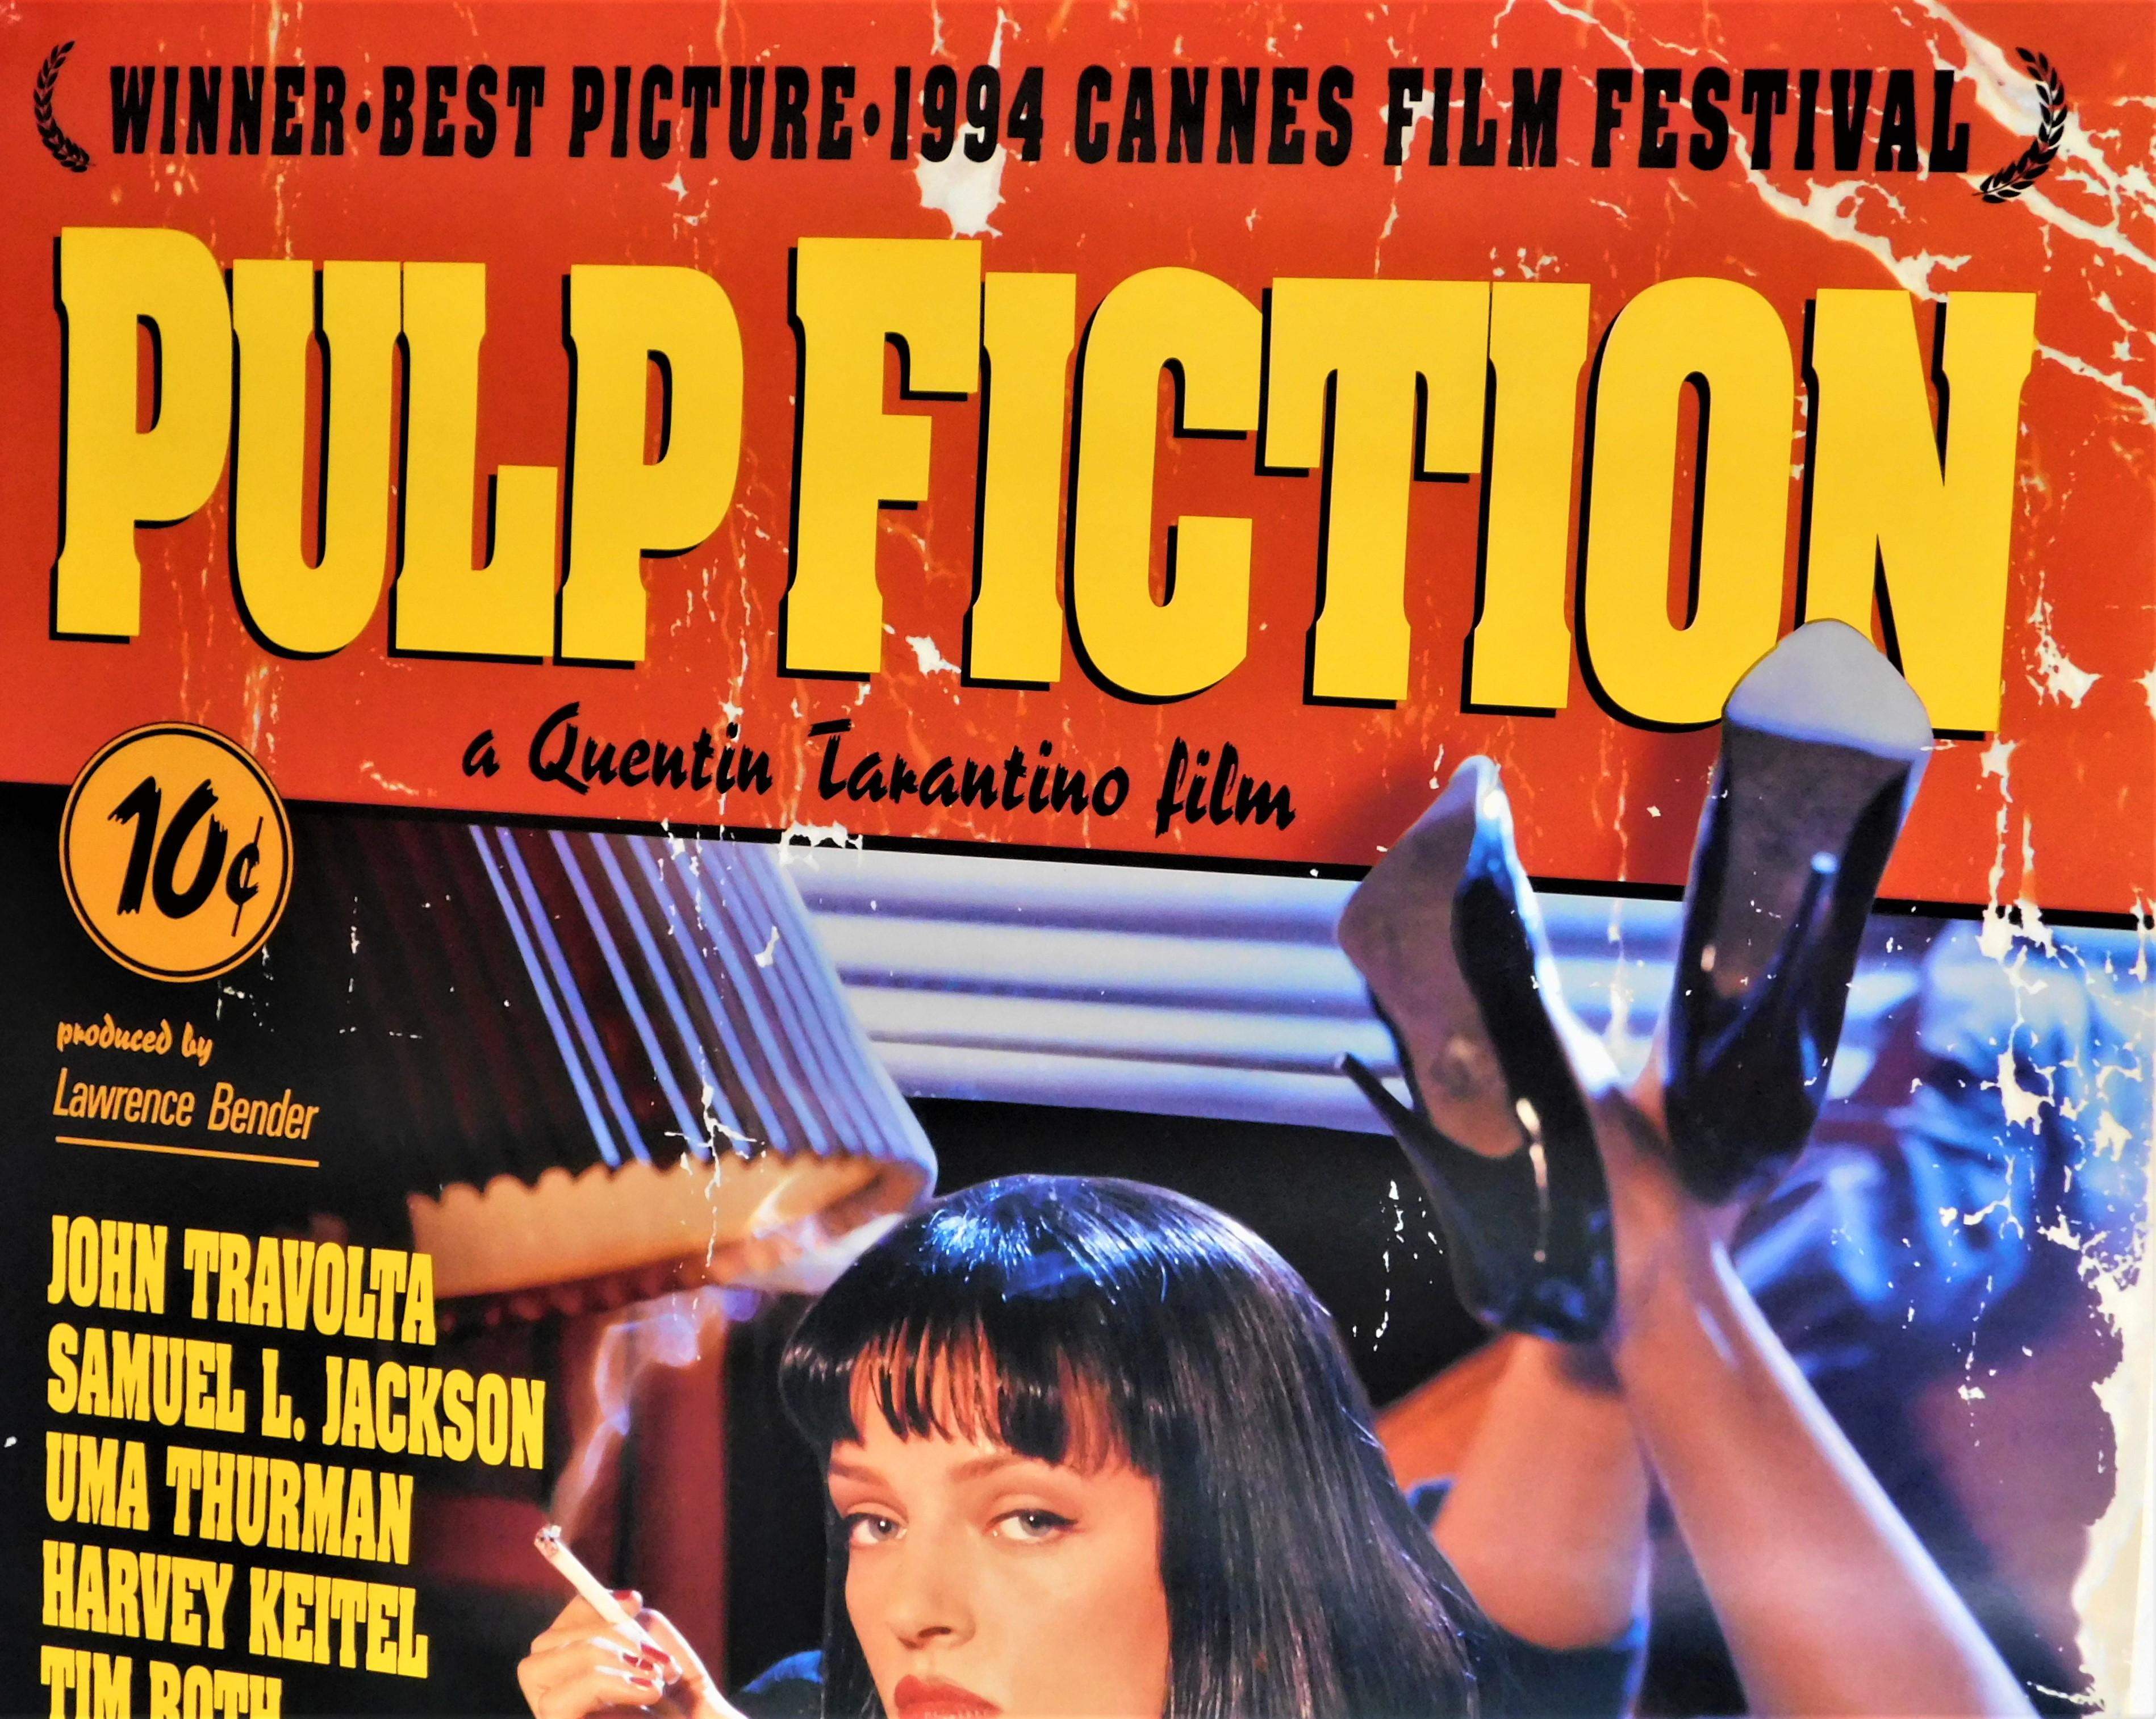 PULP FICTION Movie PHOTO Print POSTER Film Art Quentin Tarantino Uma Thurman 006